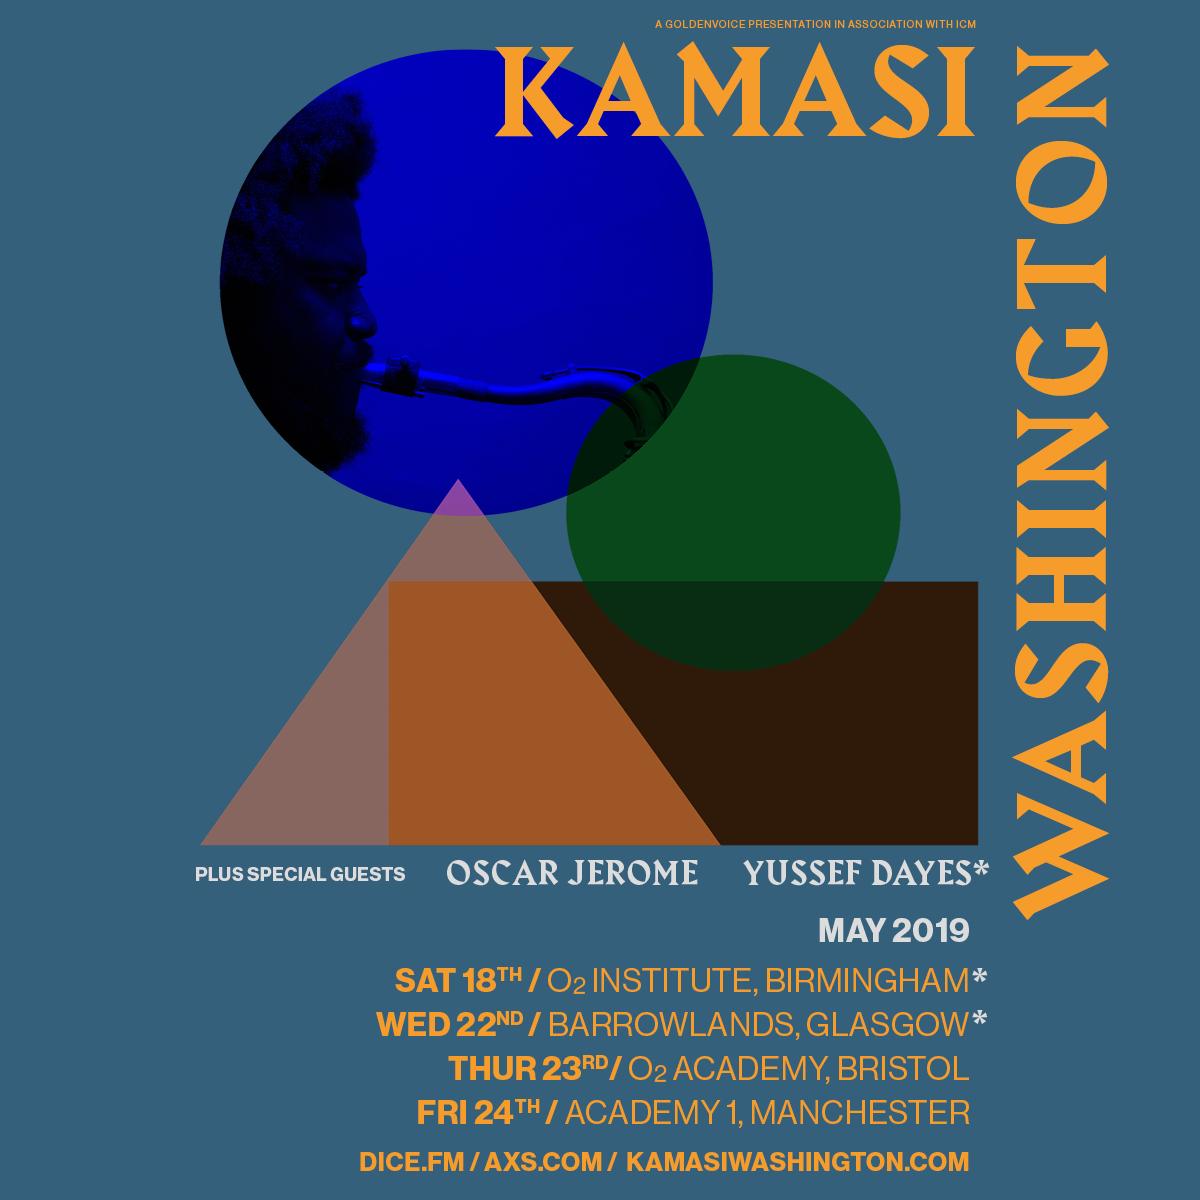 Kamasi May 2019 sq OJ.jpg